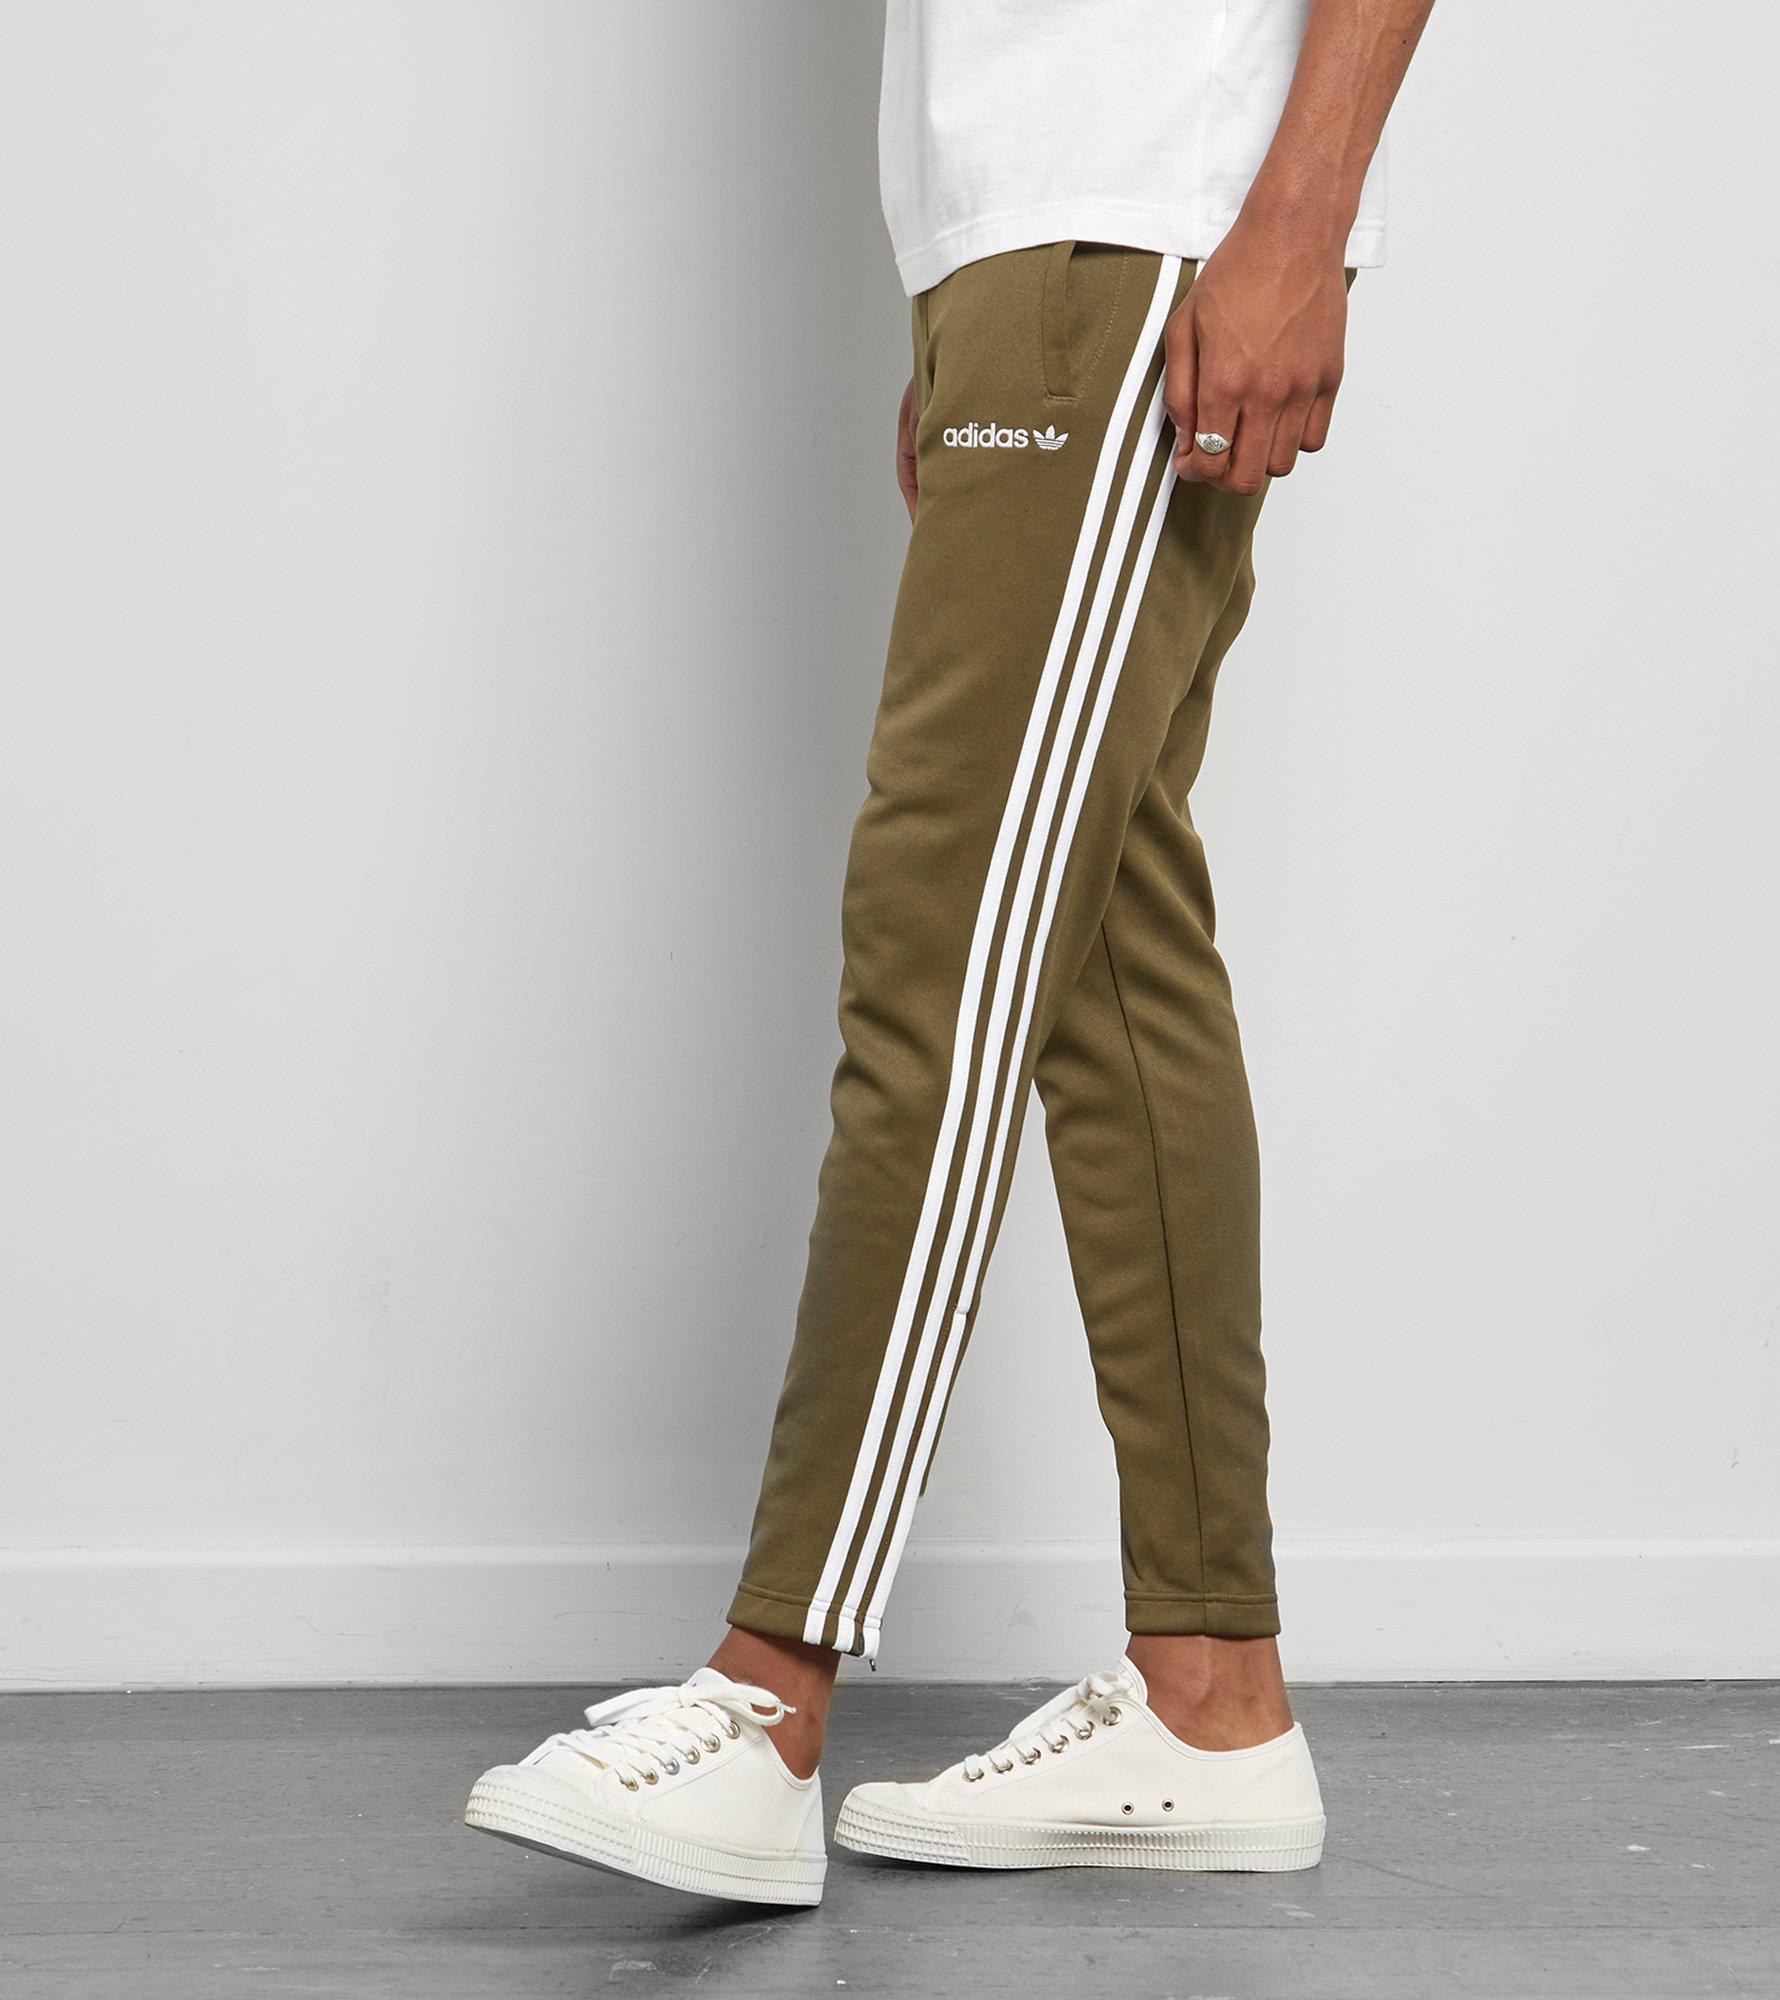 e232c50422 adidas Originals Superstar Taper Track Pant - Size  Exclusive in ...